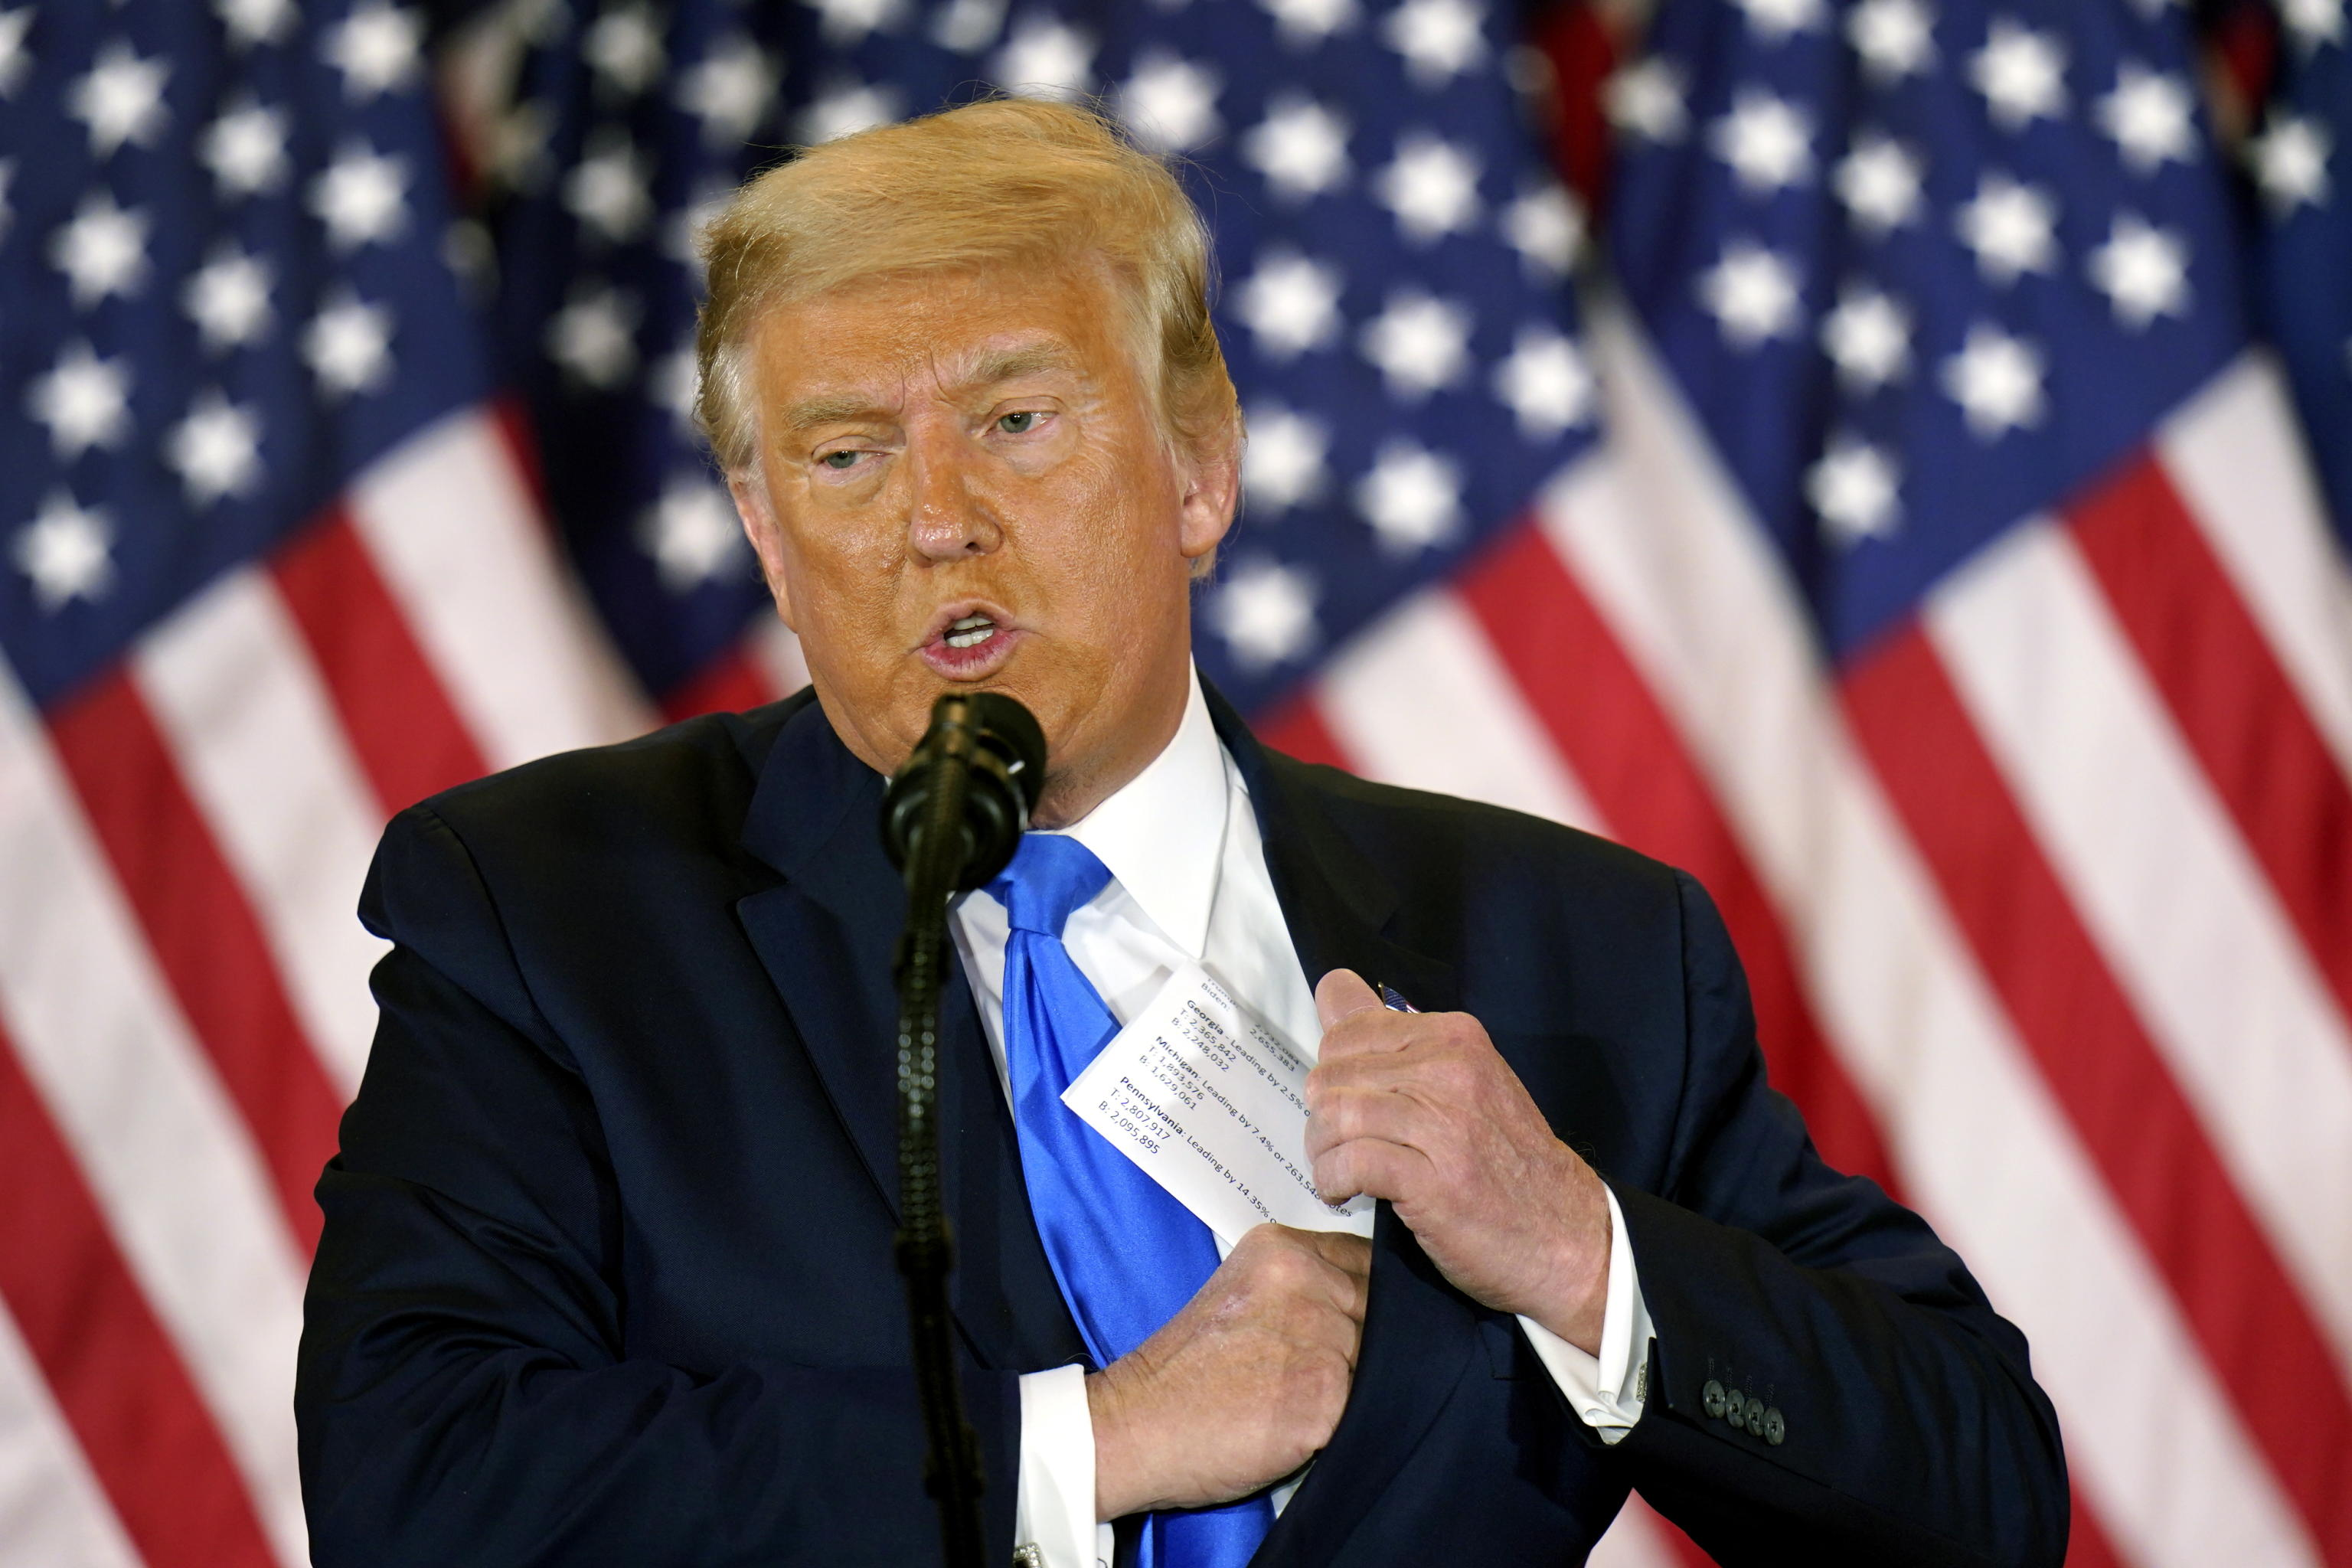 Trump: le ultime news sull'ex presidente USA cover image